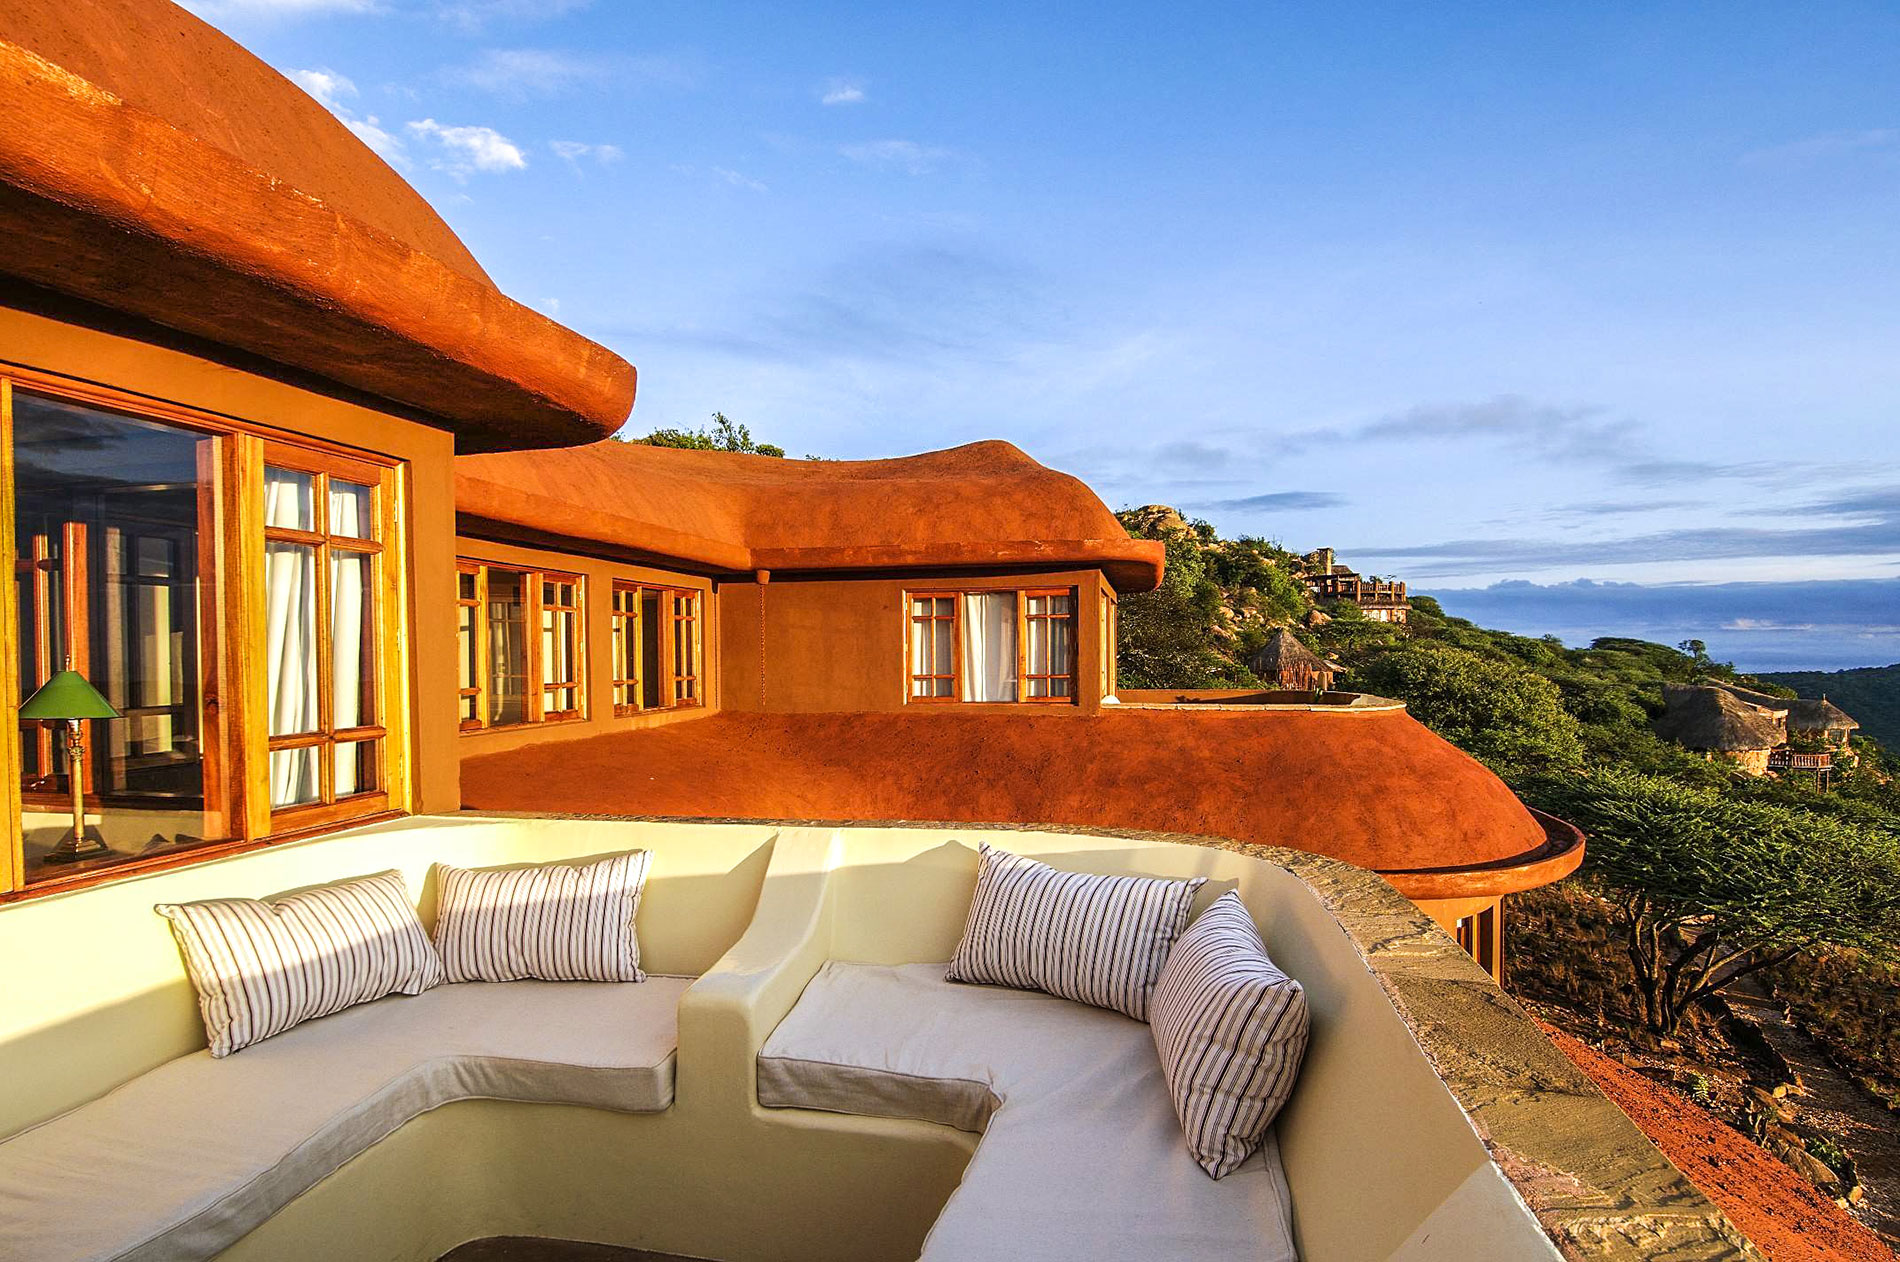 The Sanctuary at Ol Lentille Kenya